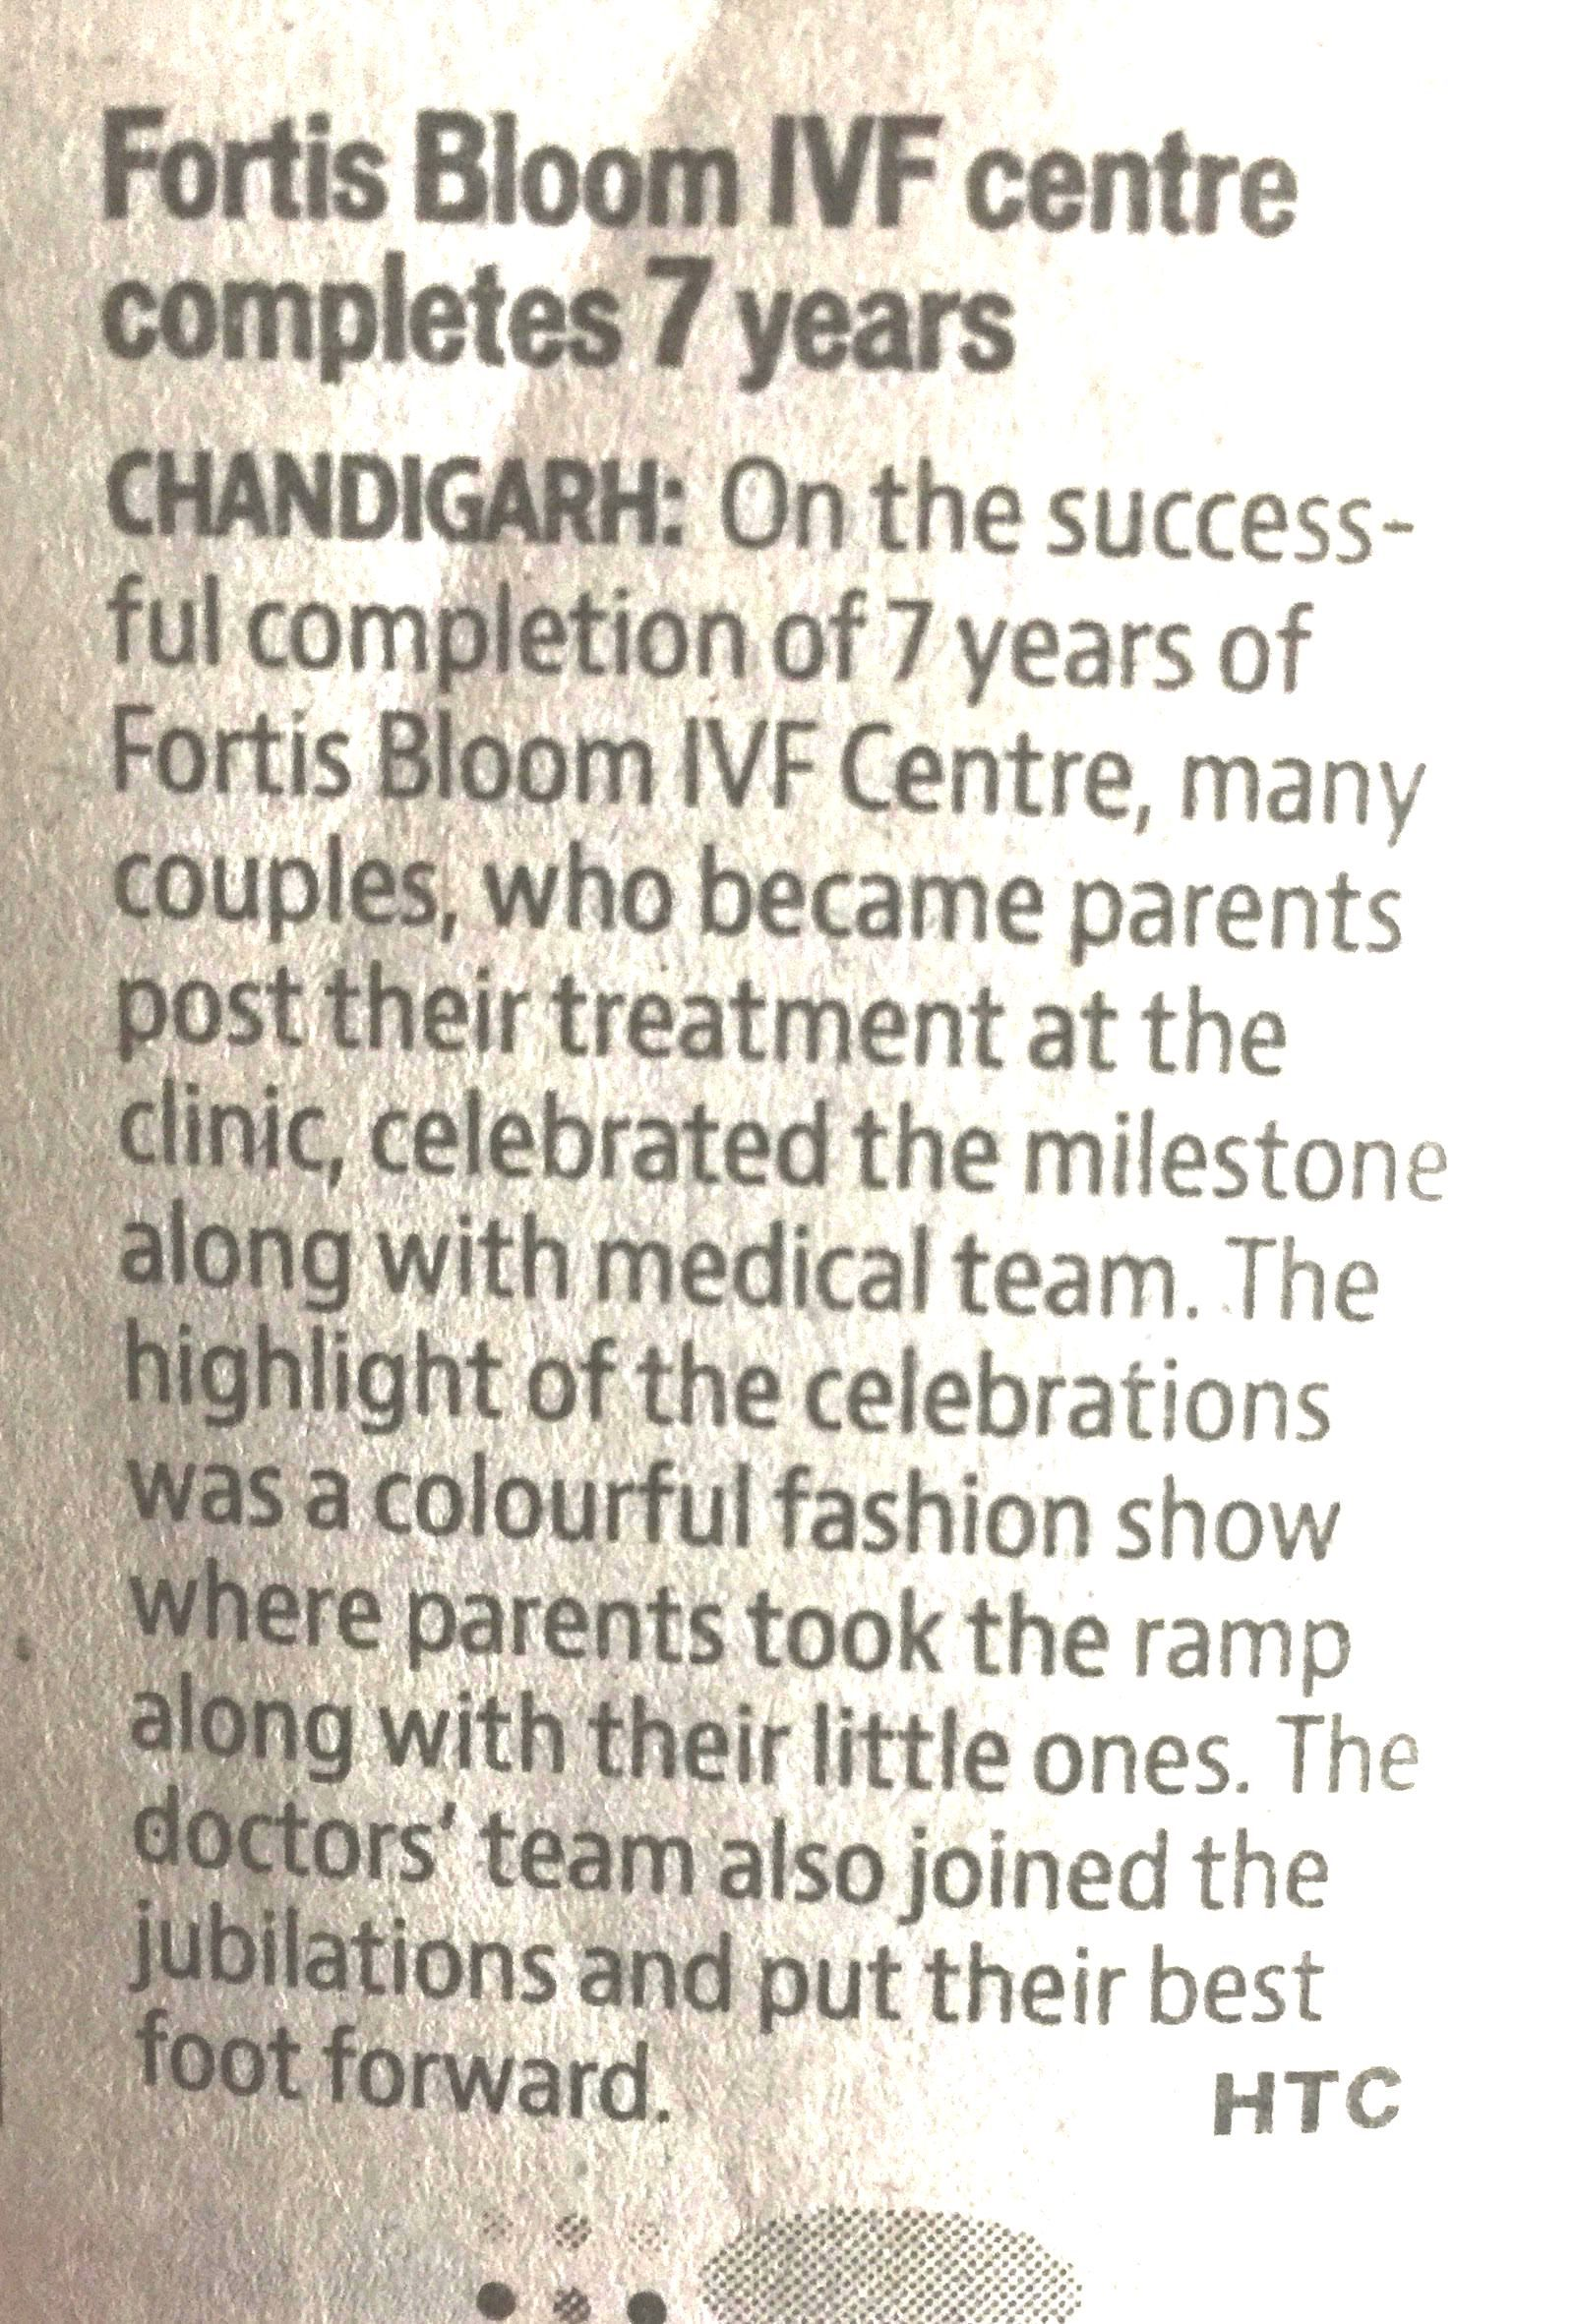 Hindustan Times P- 3 Dec 15